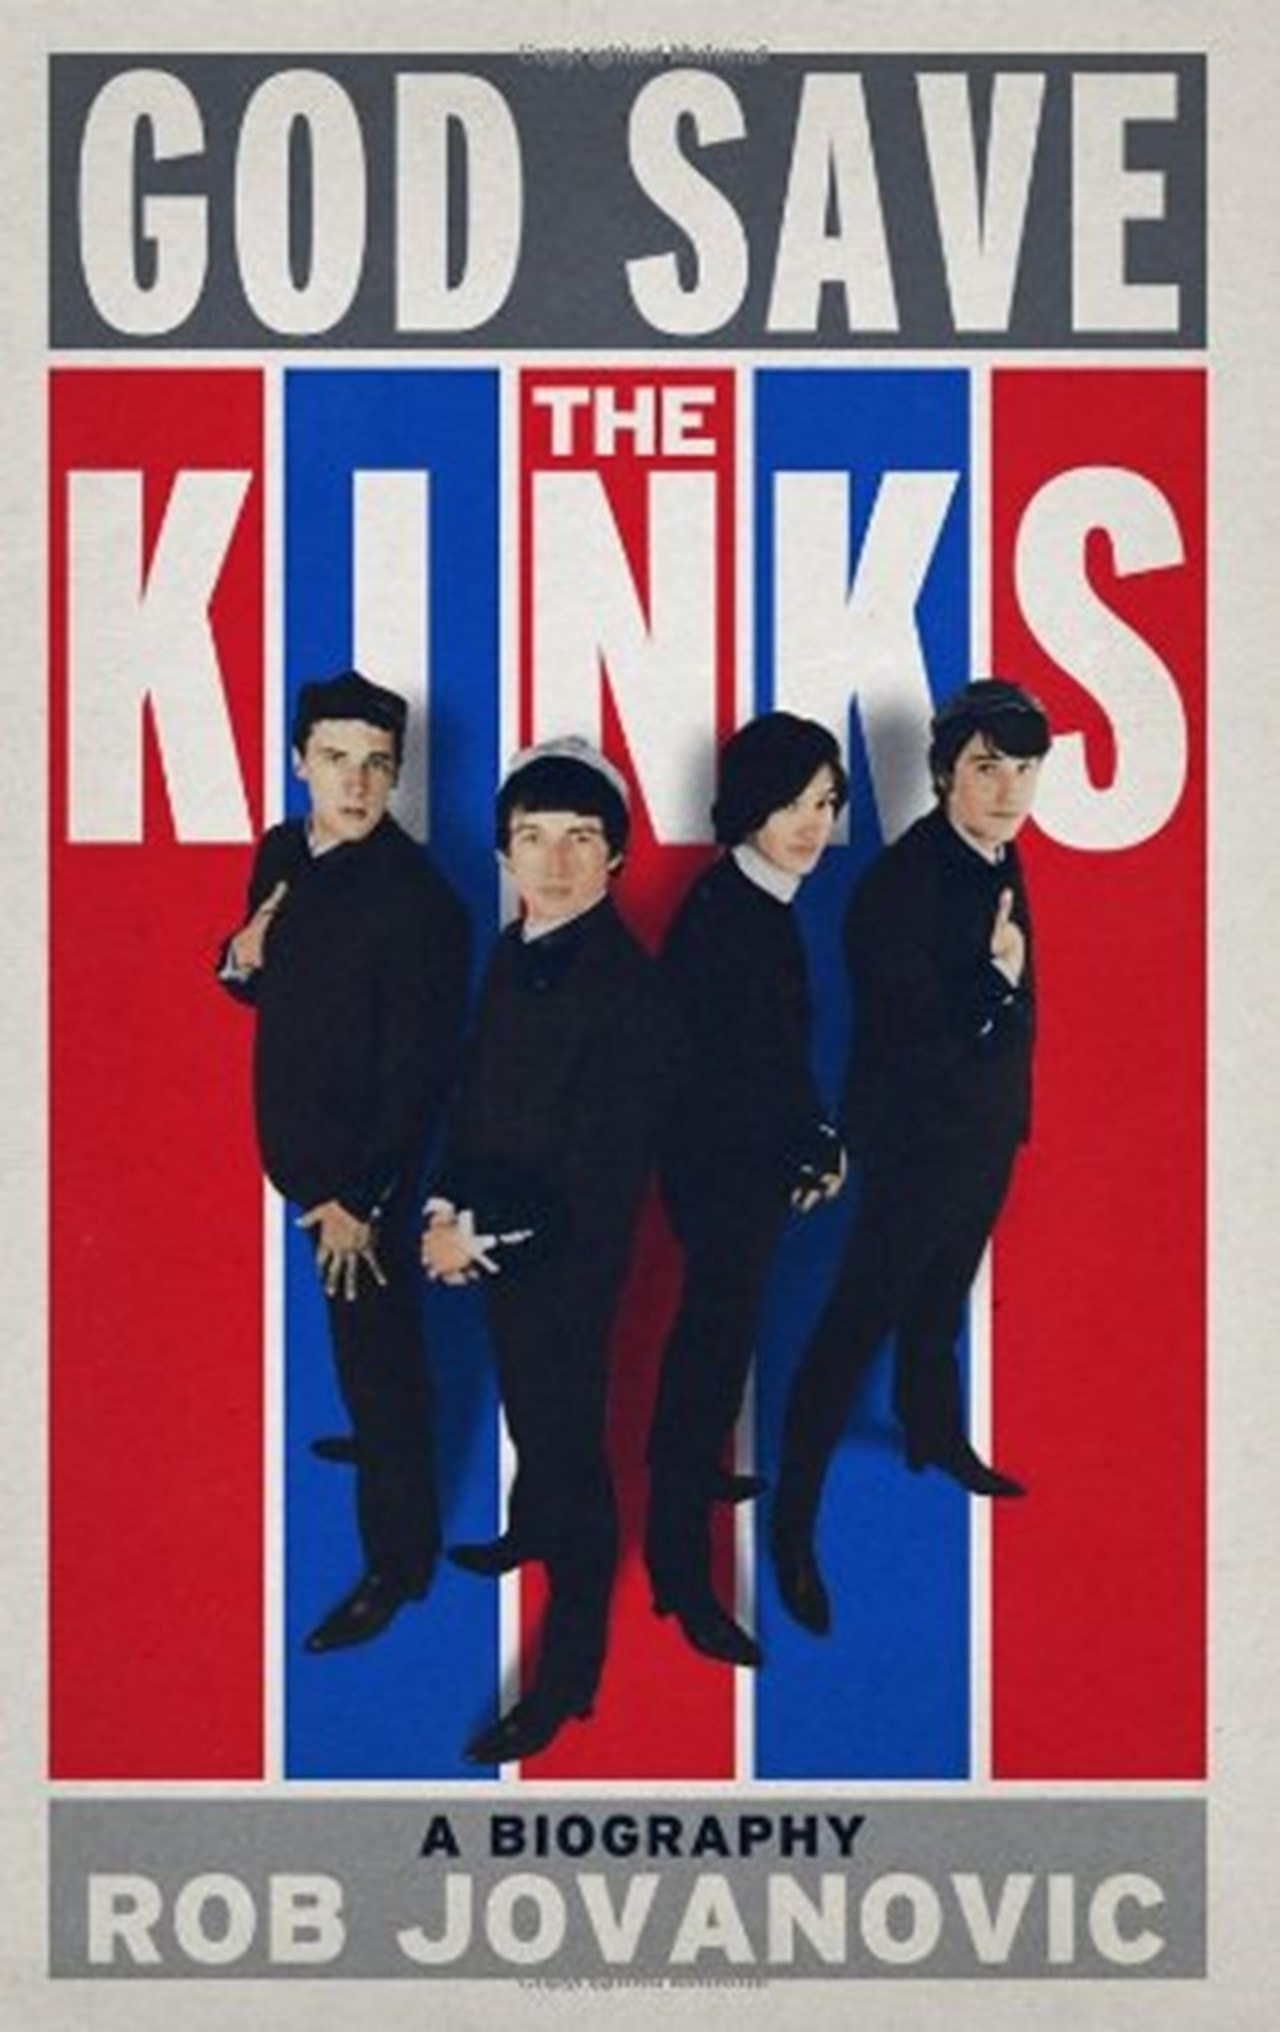 God Save The Kinks - 1